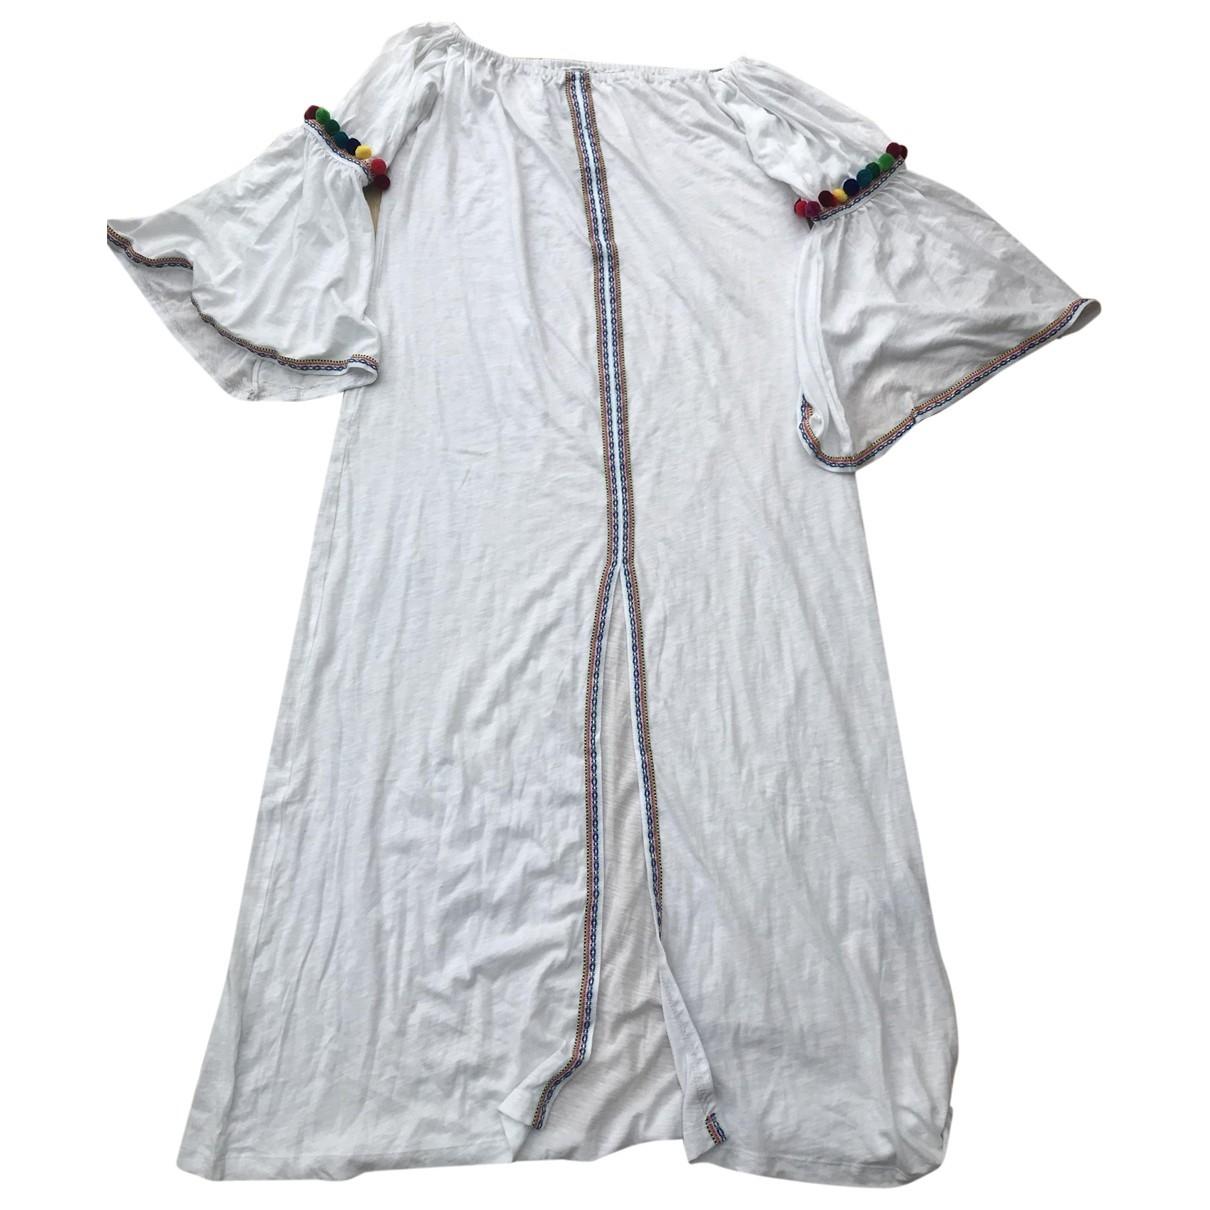 Pitusa \N White Cotton dress for Women One Size International